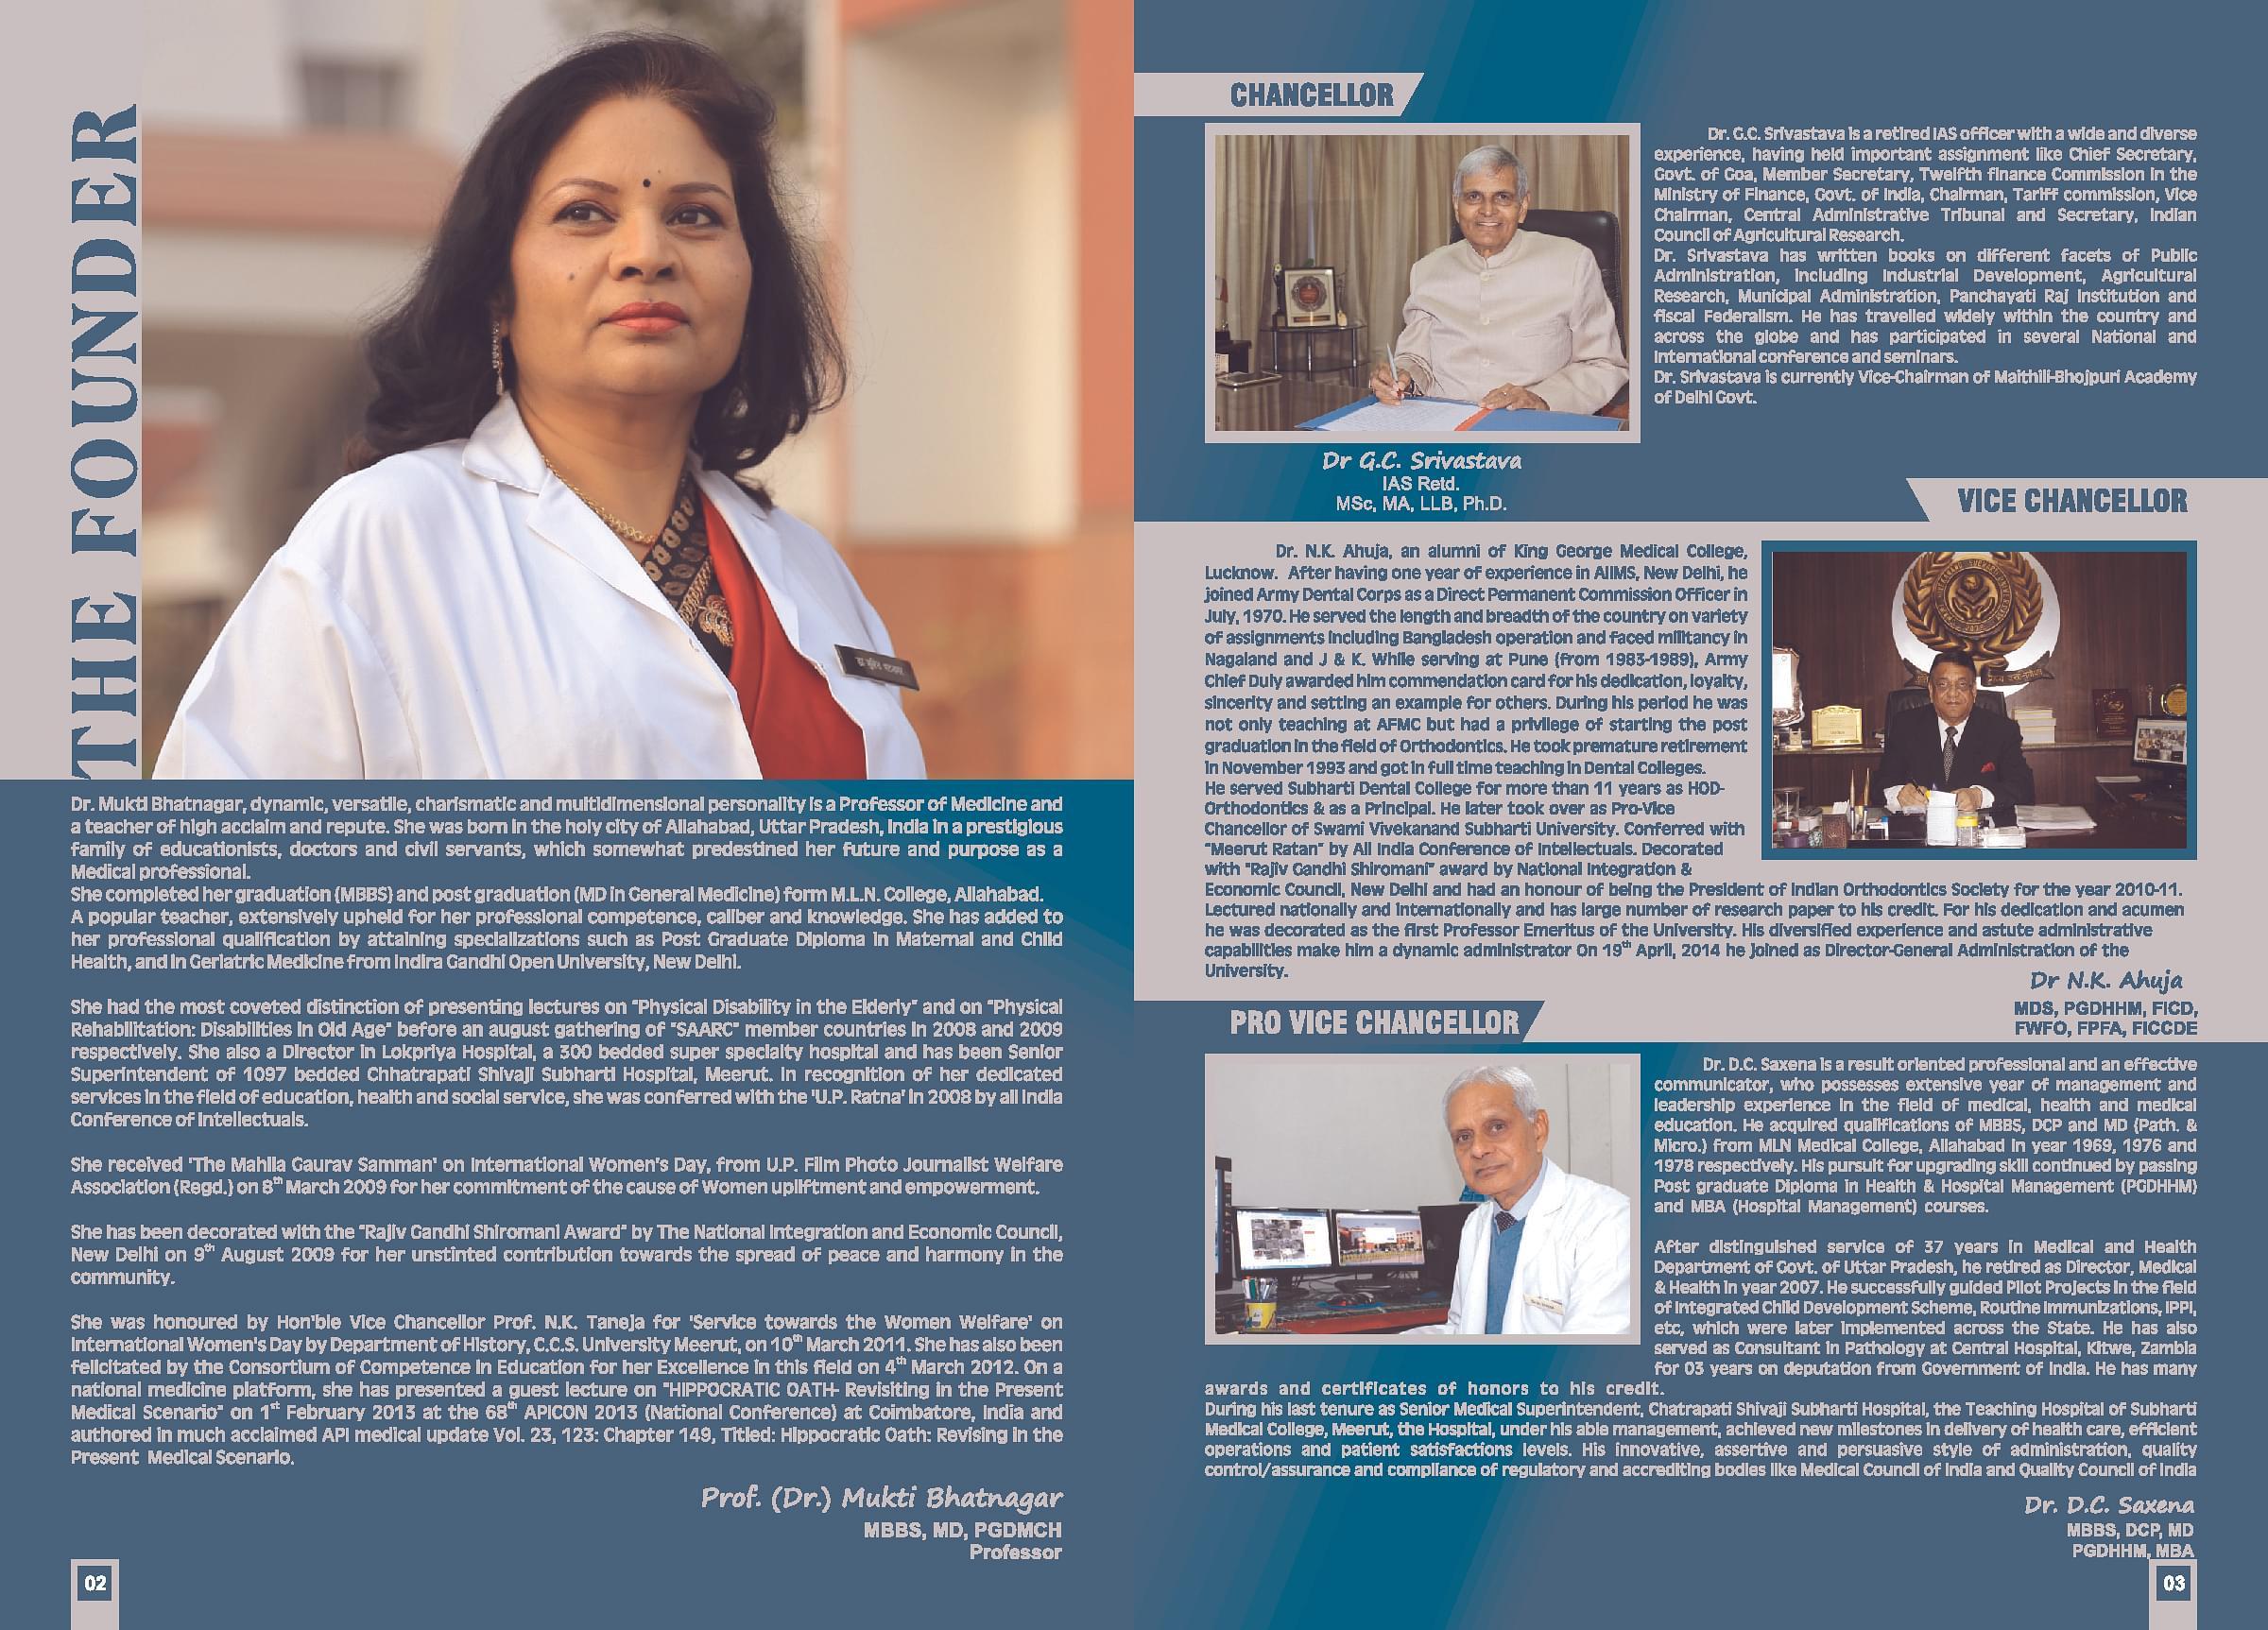 Swami Vivekanand Subharti University, Directorate of Distance